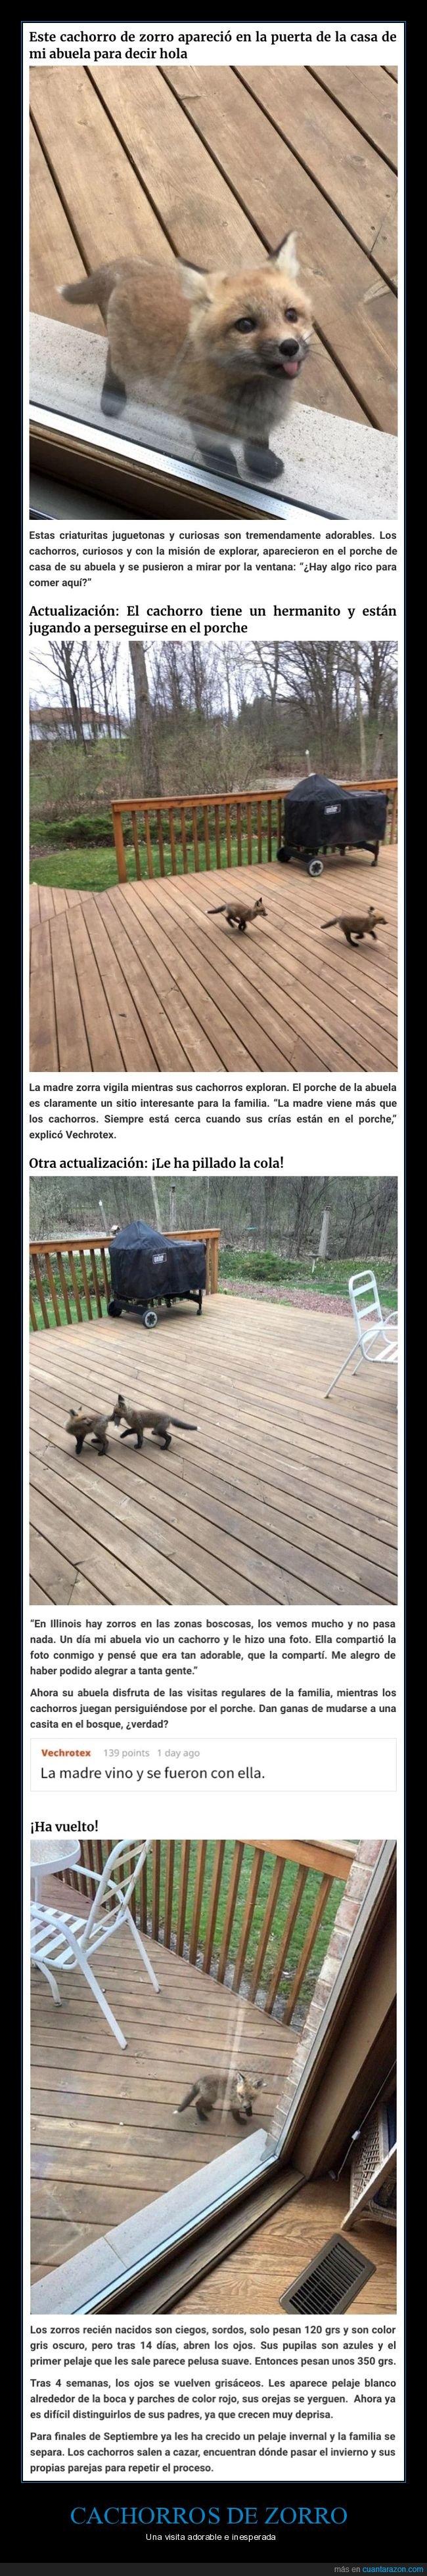 cachorros,zorros